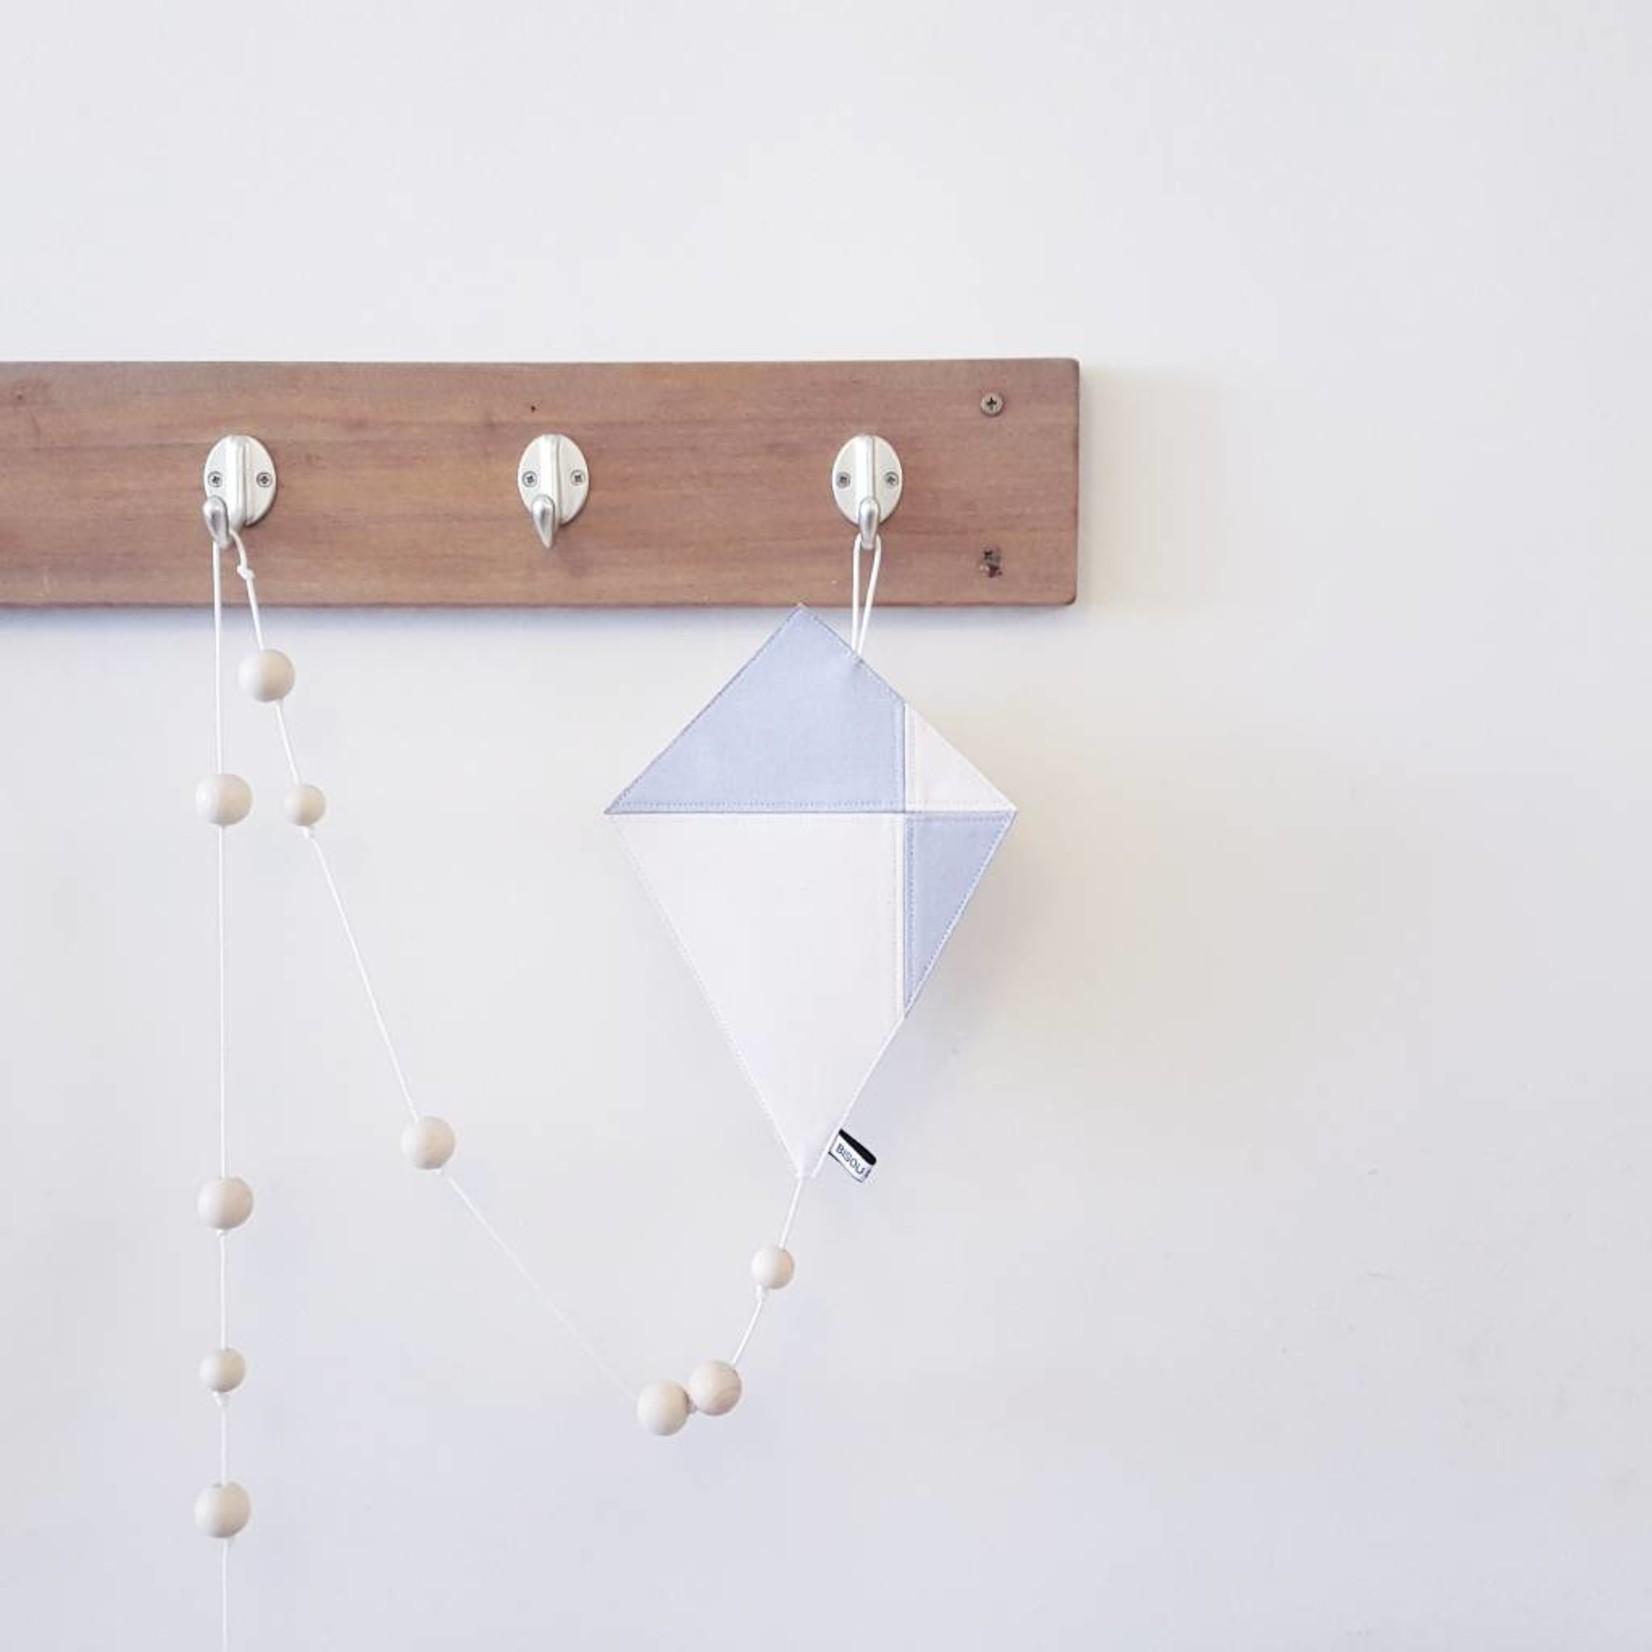 Bisou de Lou Kite | Hanger Grey and White